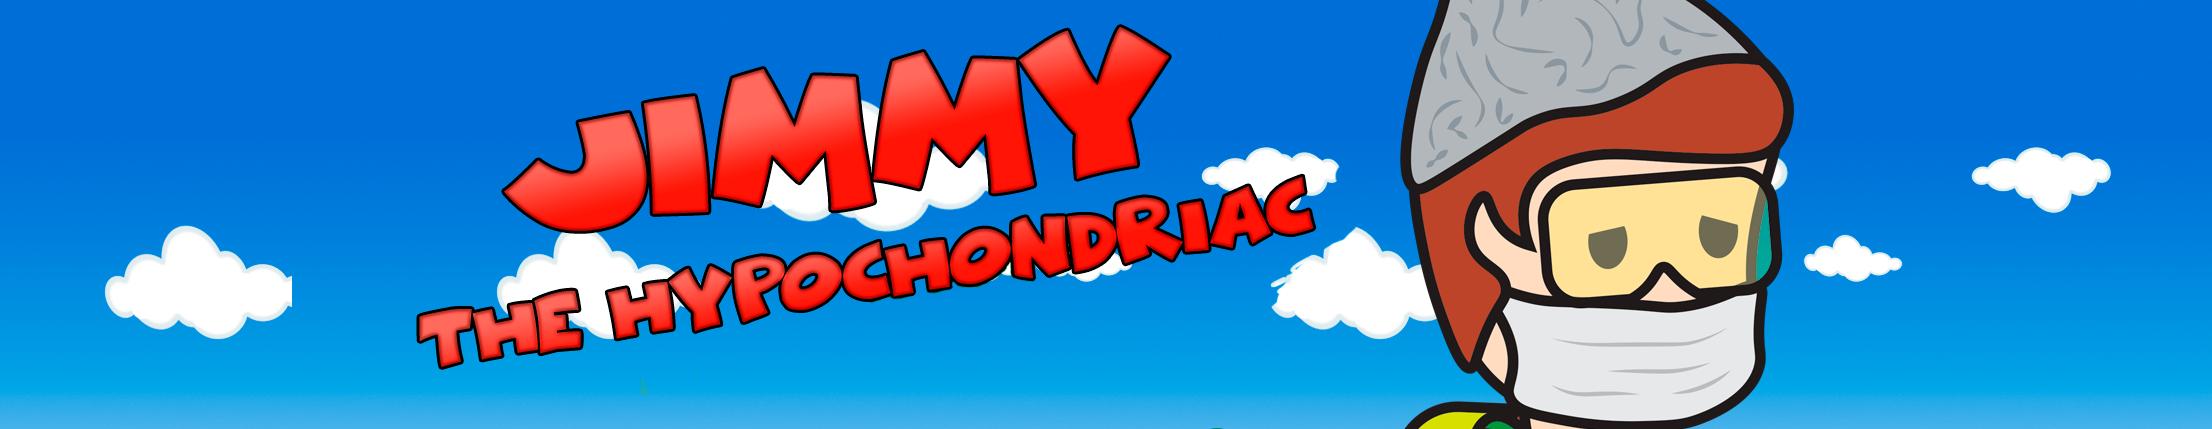 Jimmy The Hypochondriac